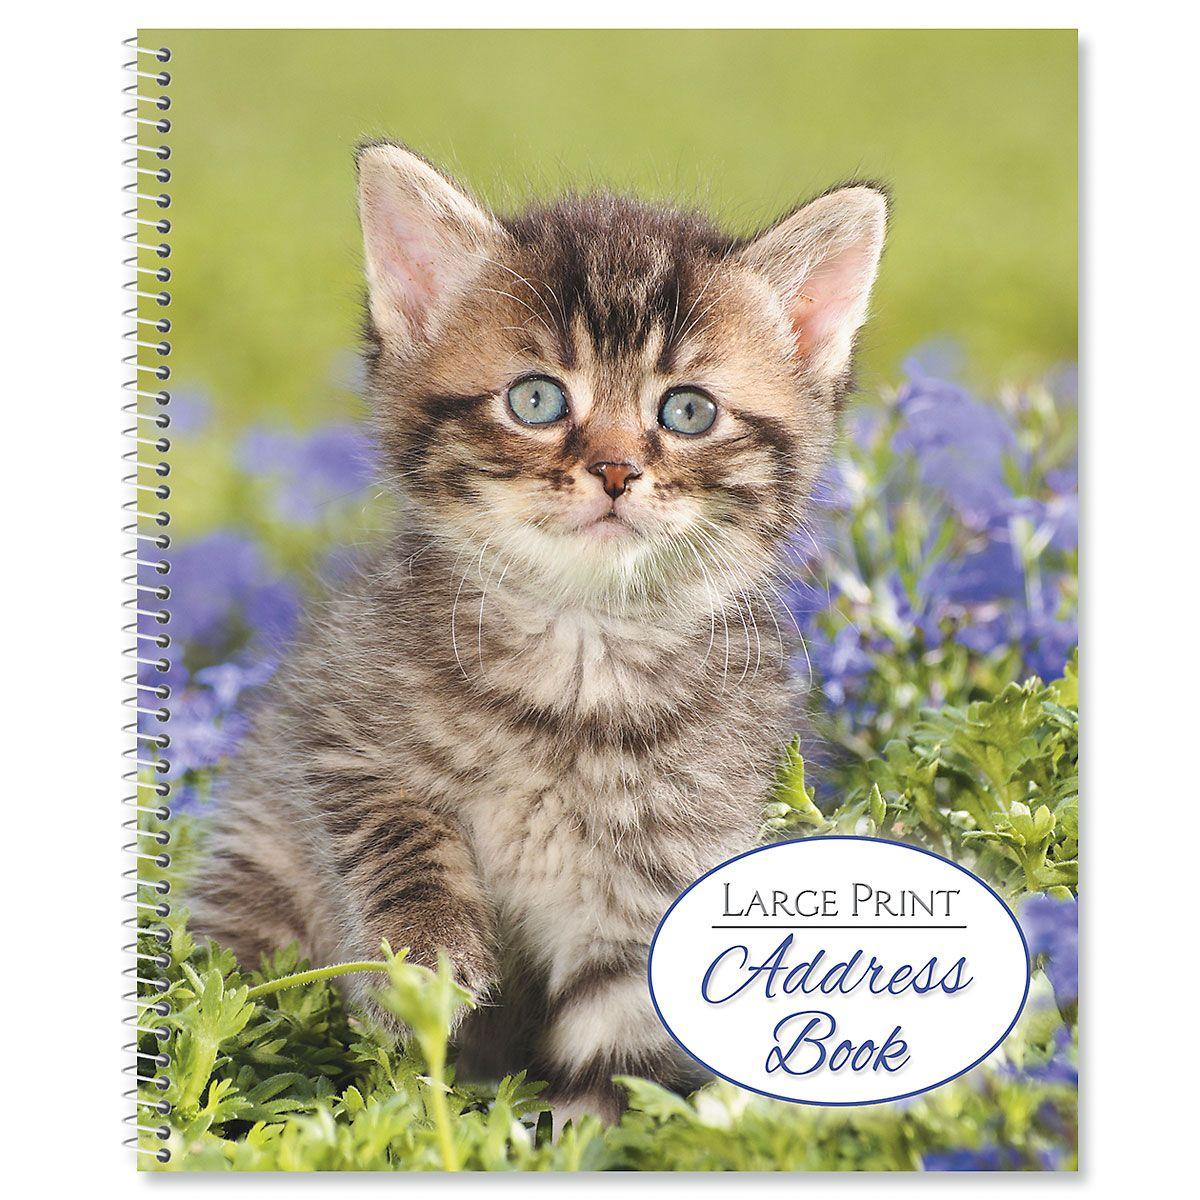 Playful Kitten Large Print Address Book